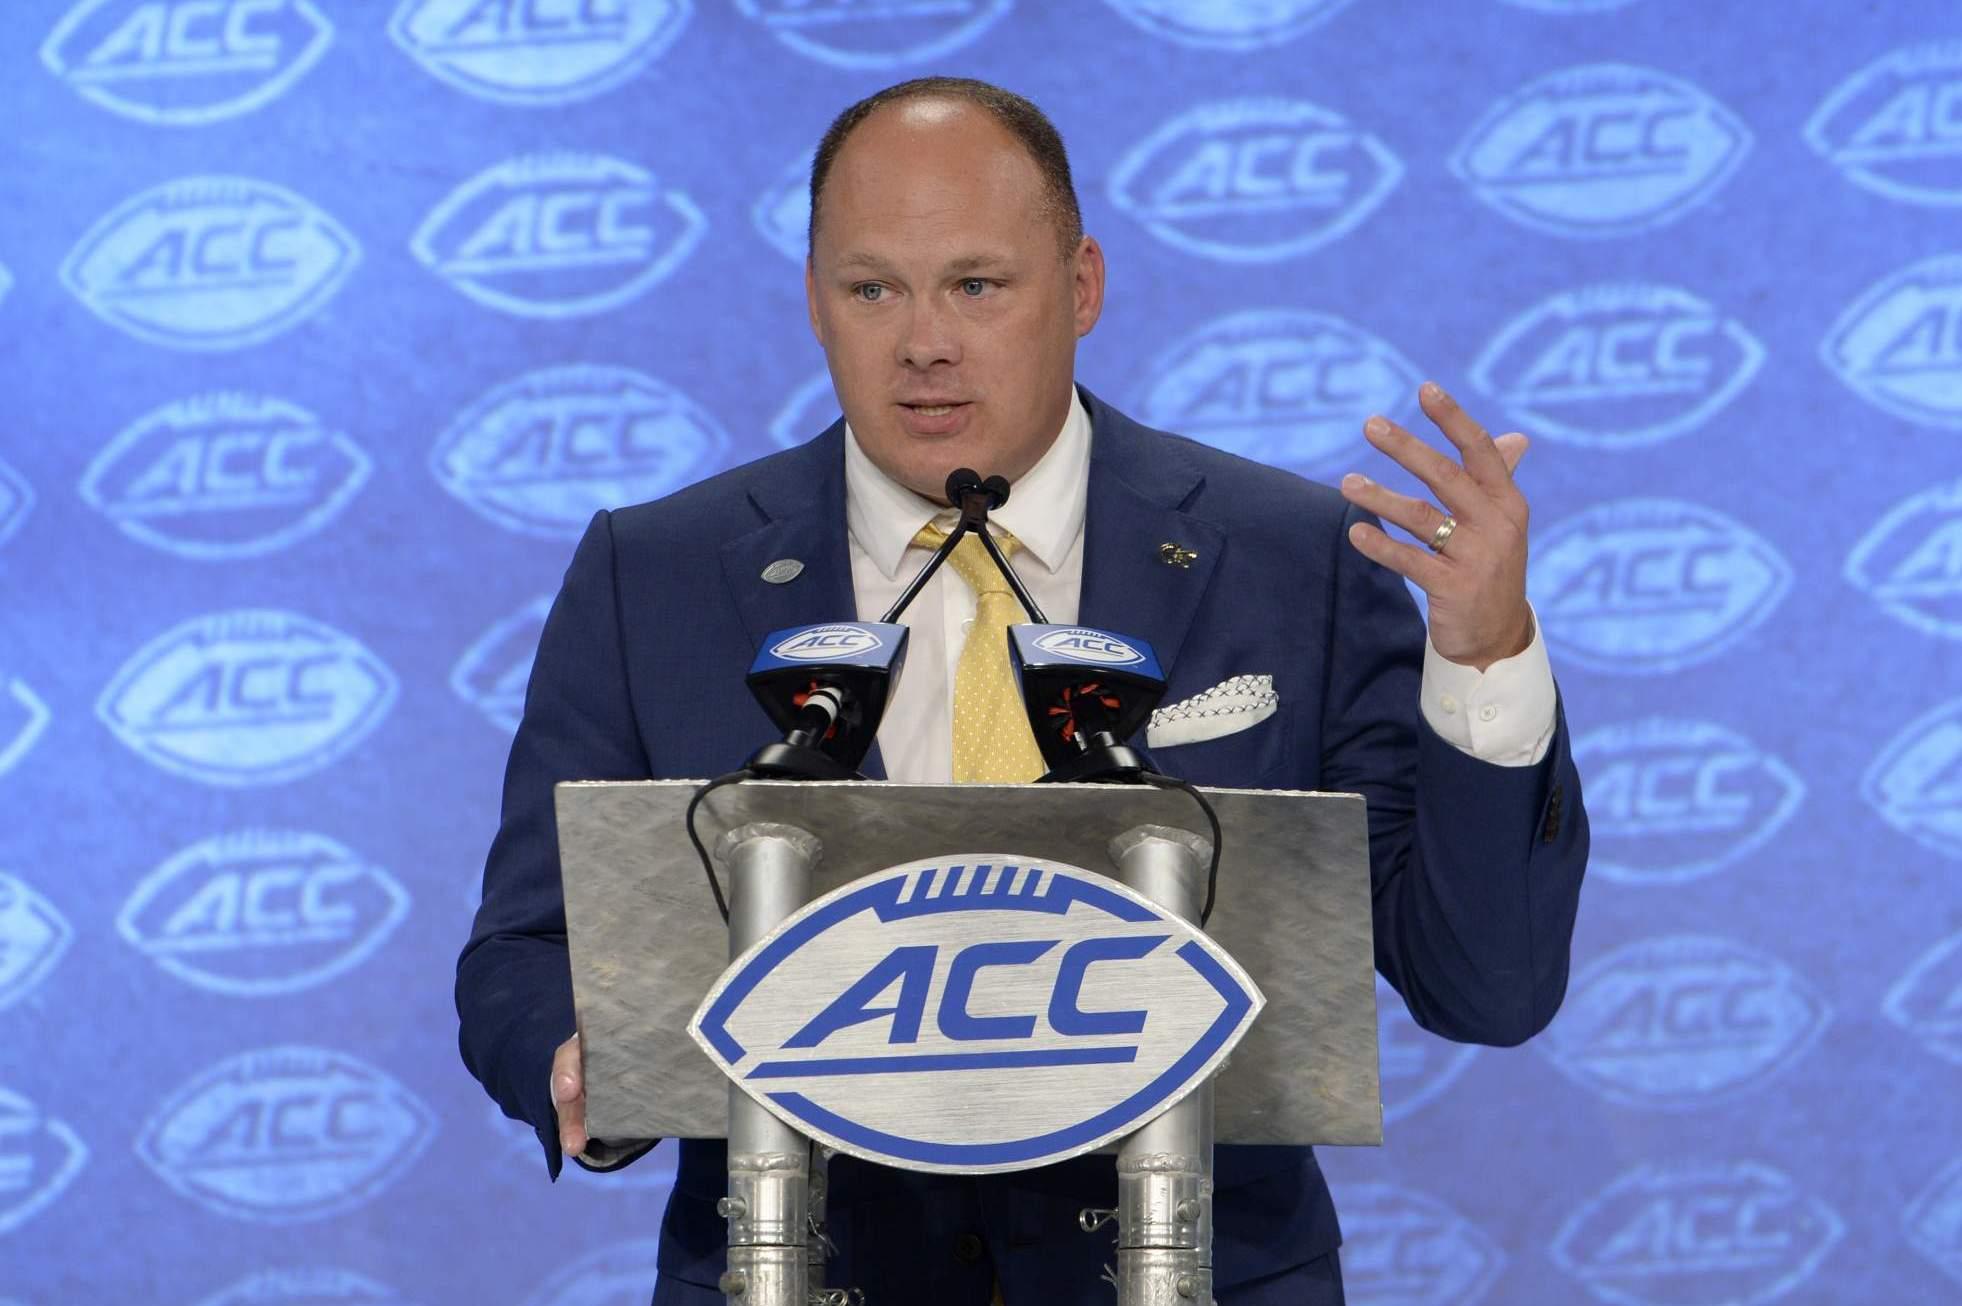 VIDEO: Georgia Tech at ACC Kickoff